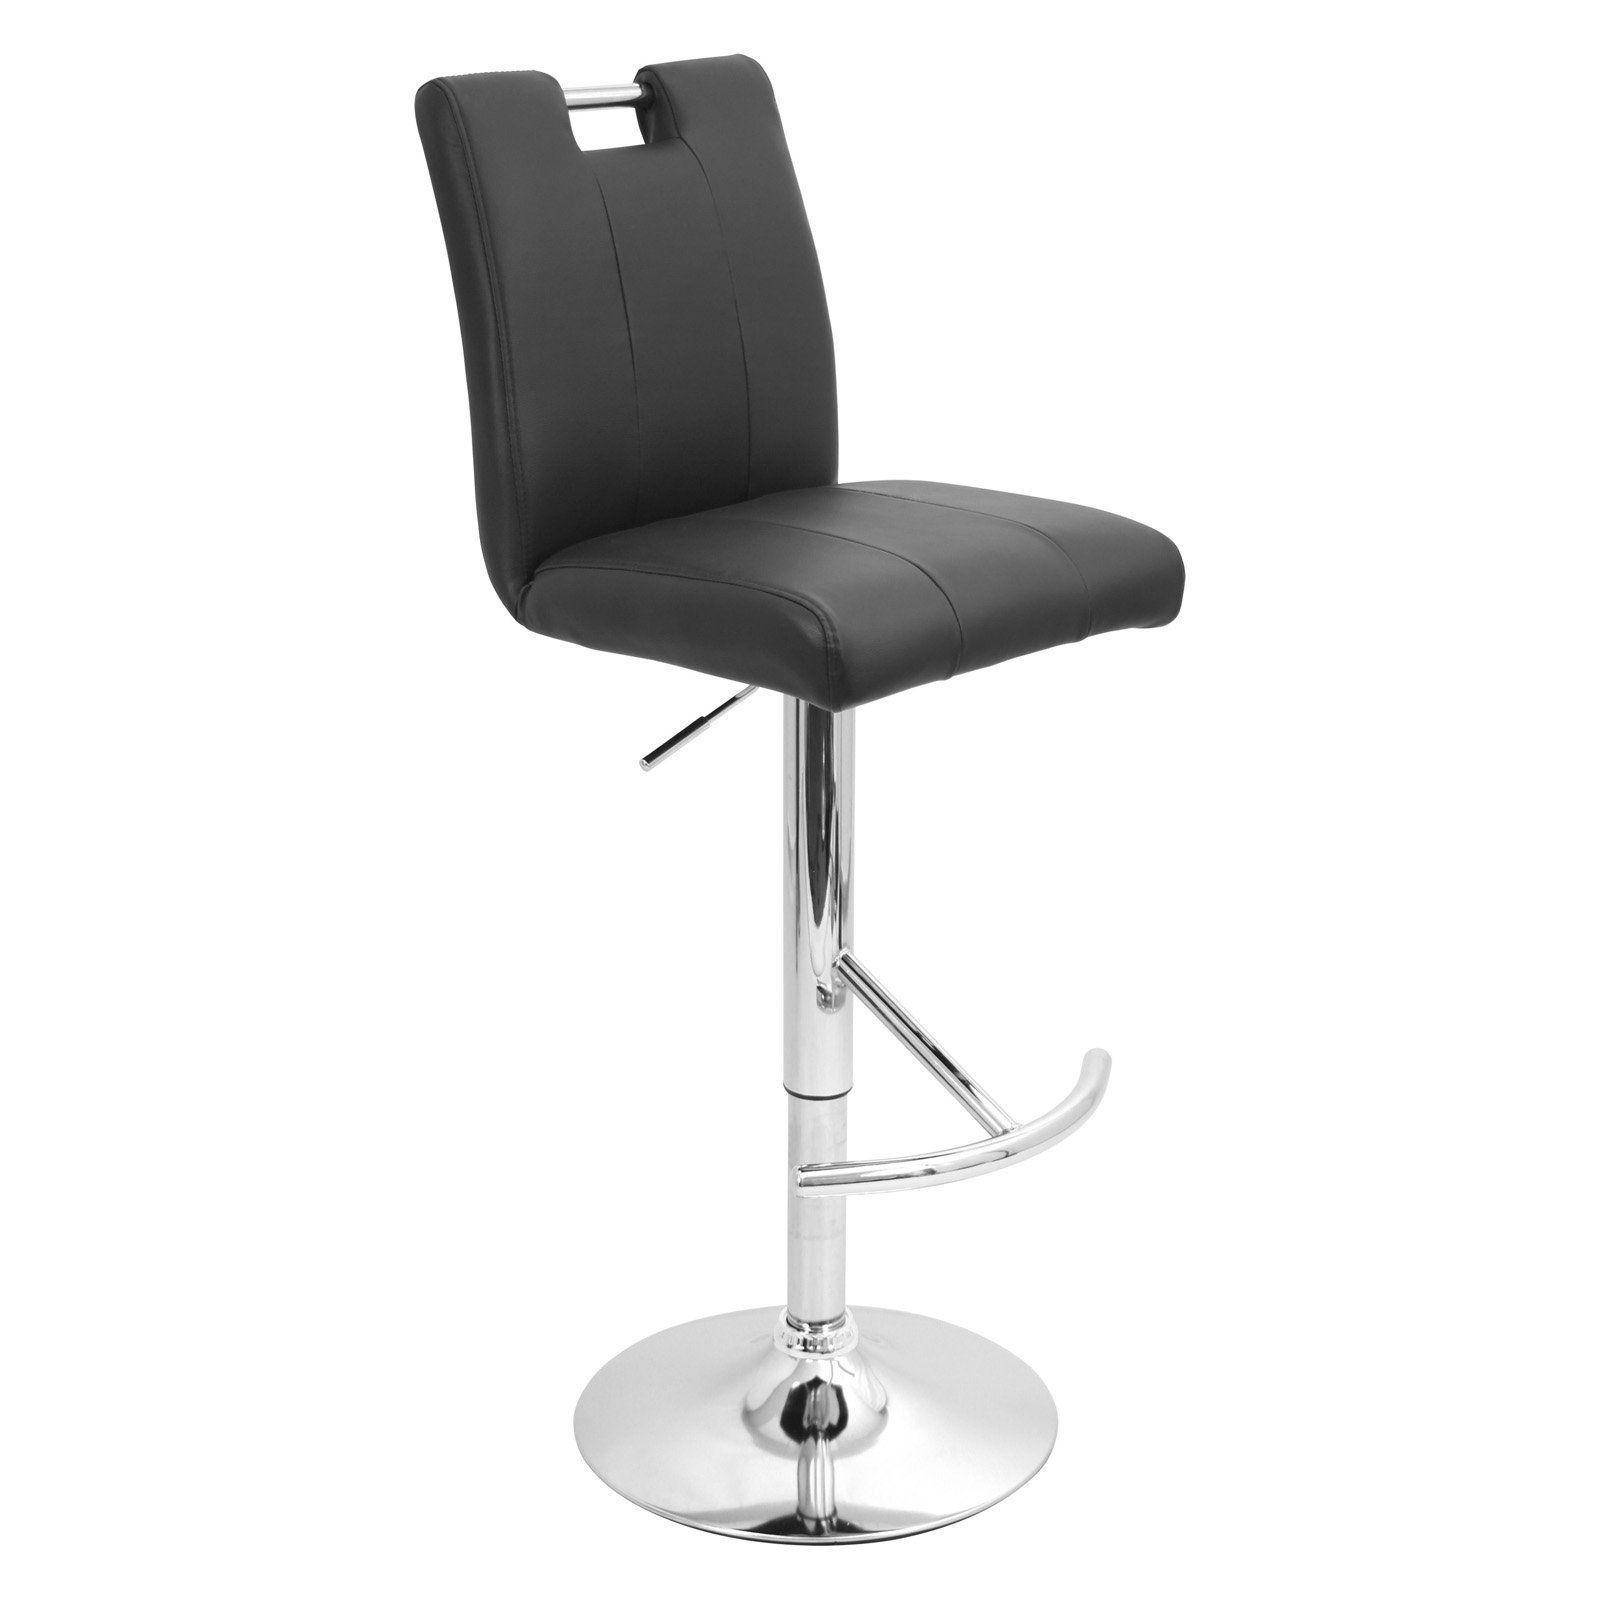 Sensational Lumisource Bar Adjustable Bar Stool Bs Tw Bar Cam Evergreenethics Interior Chair Design Evergreenethicsorg